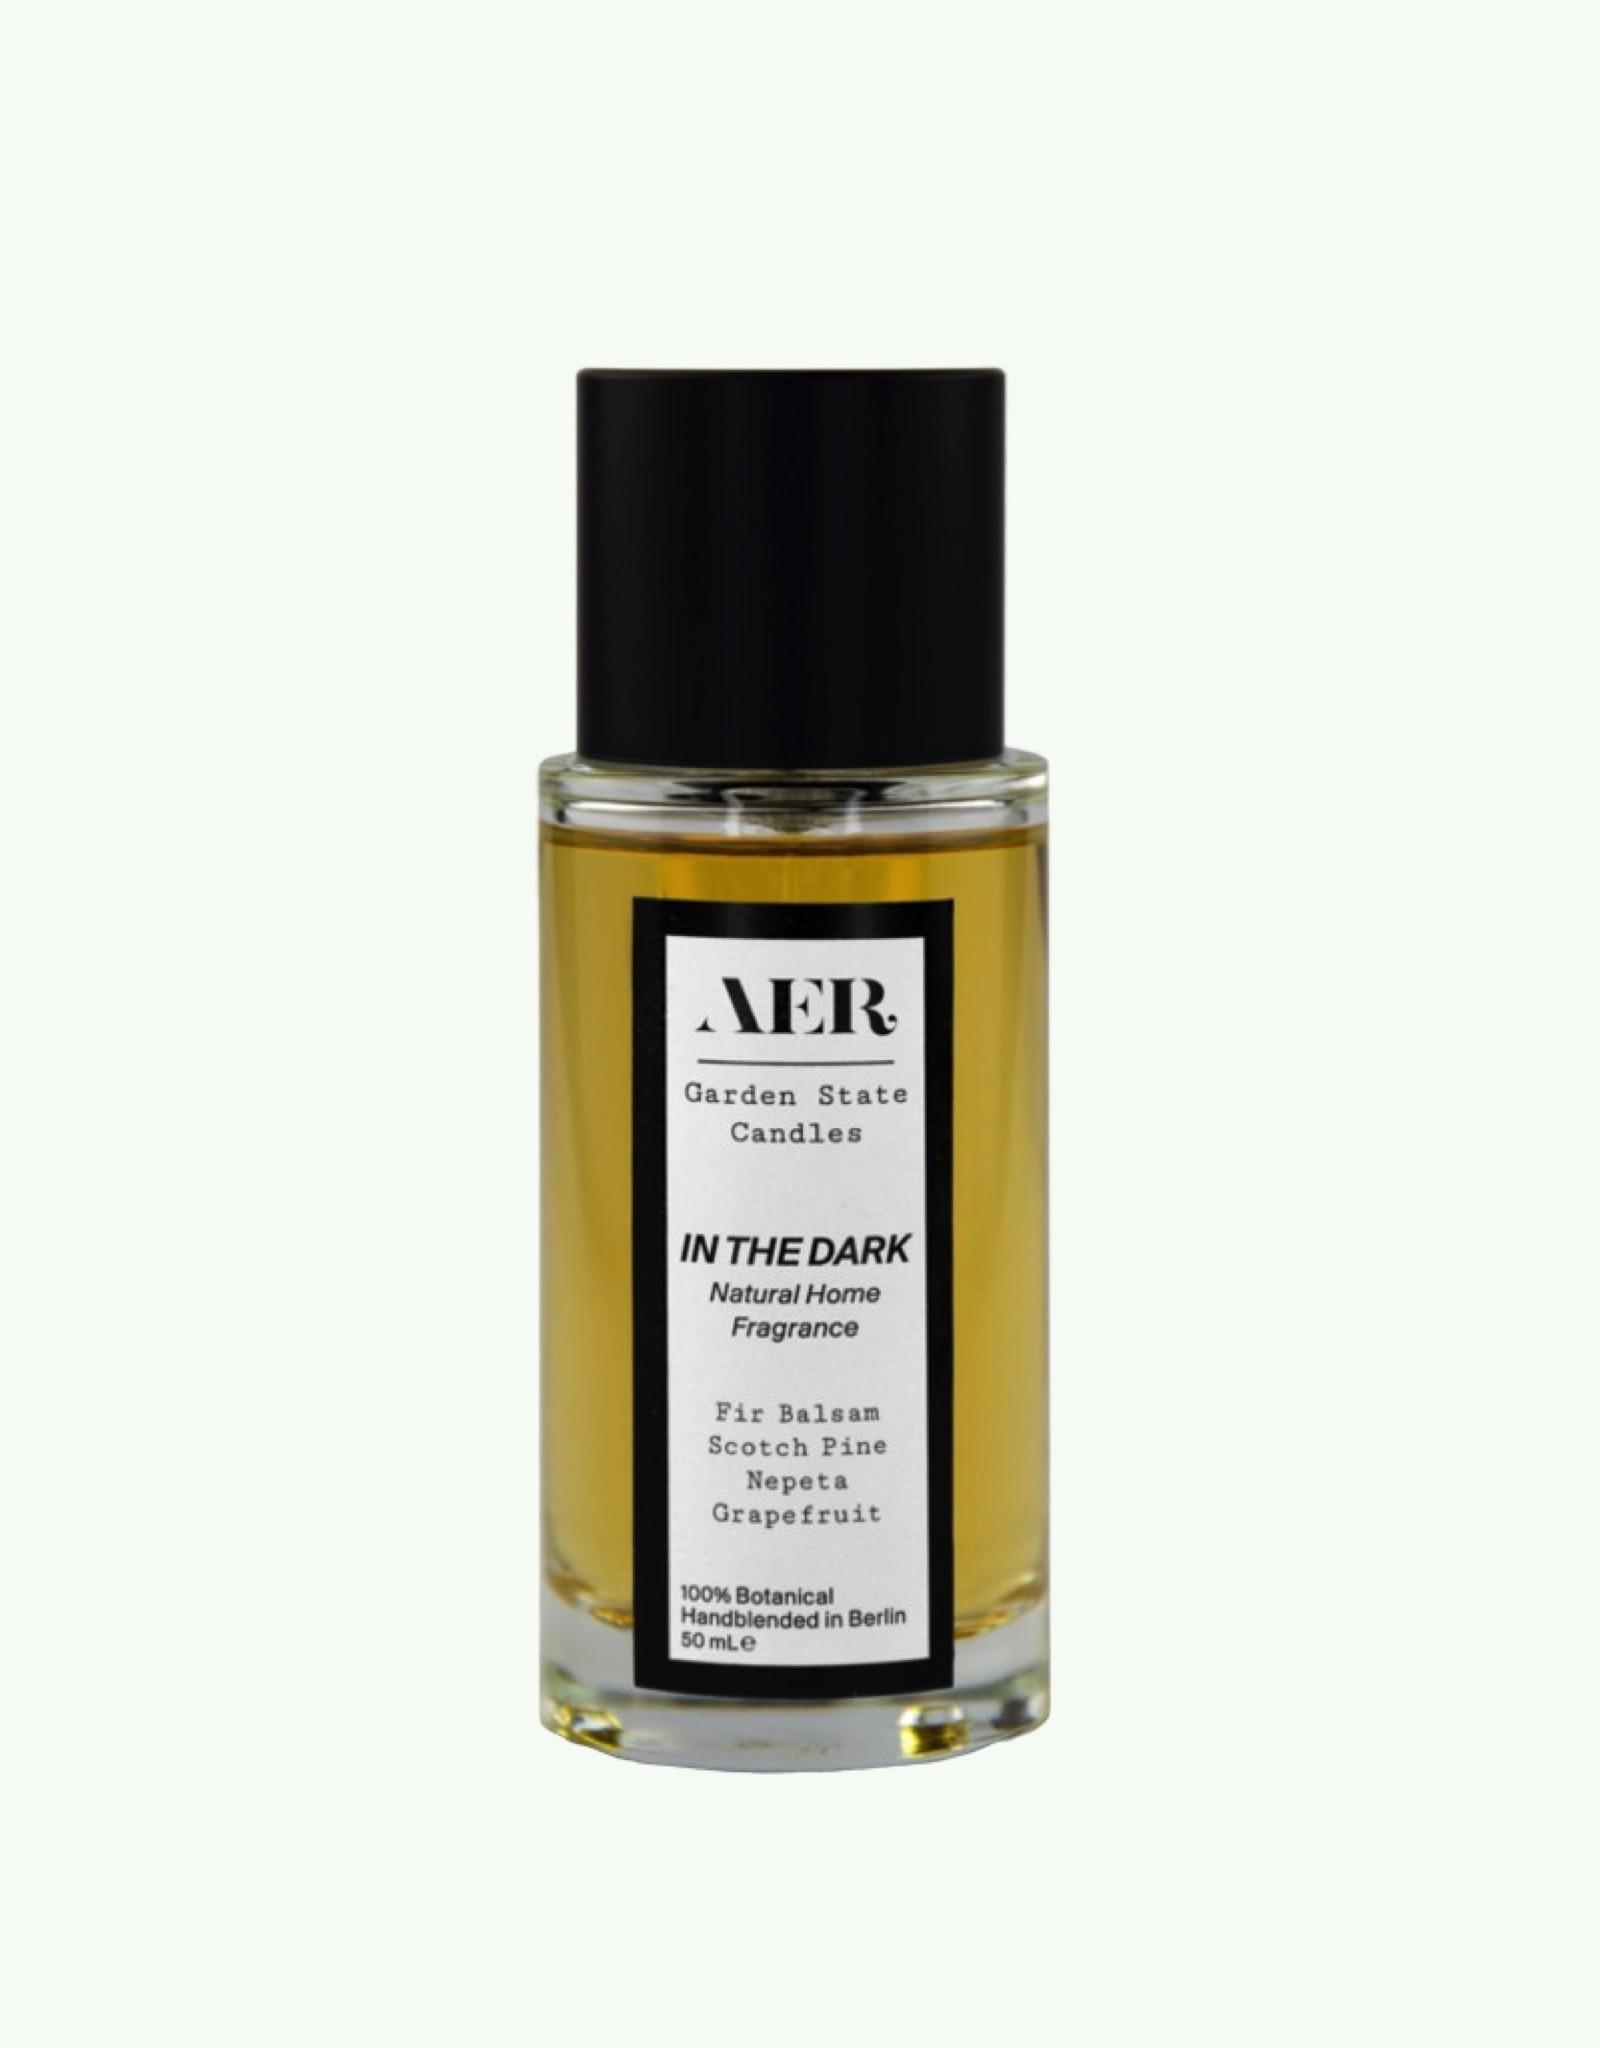 Aer AER - IN THE DARK - Parfum d'Intérieur